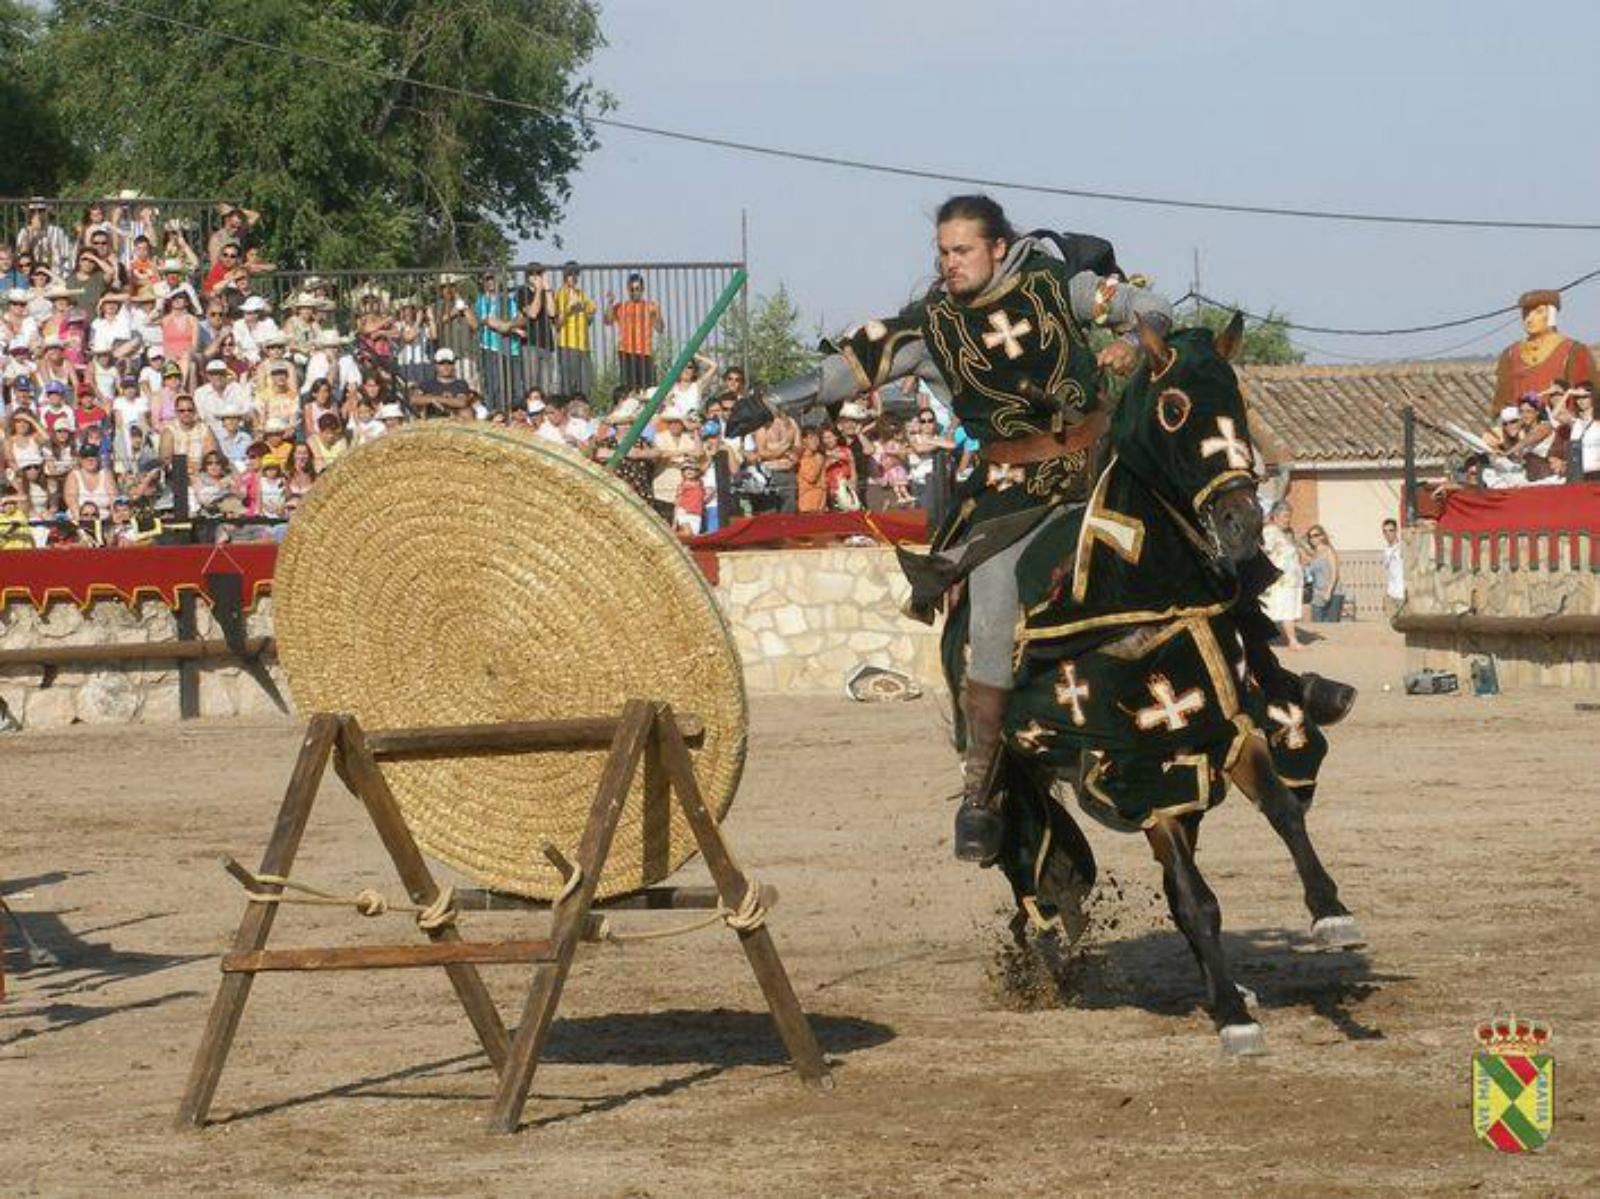 torneo medieval - festival medieval 2006